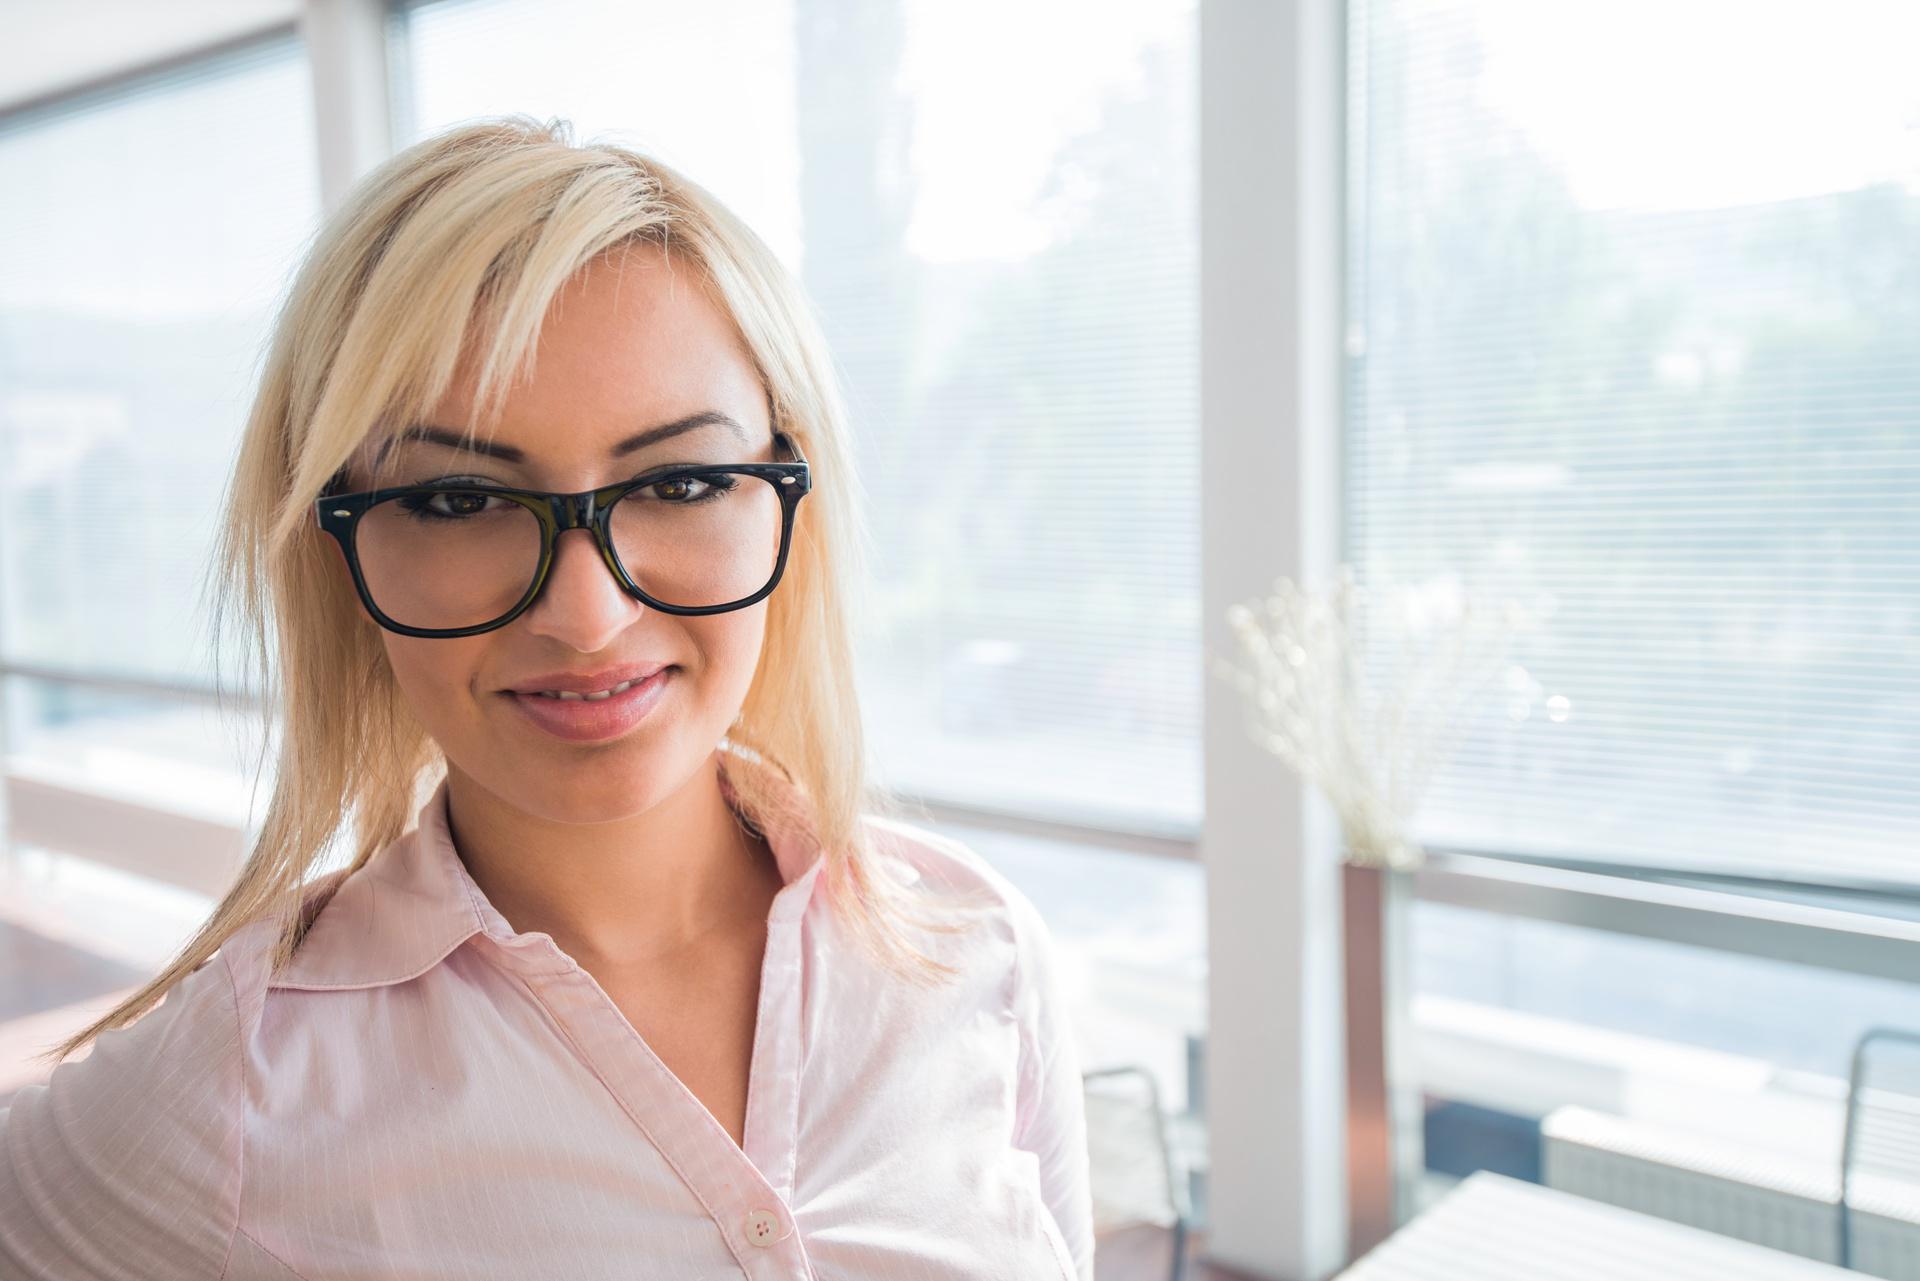 sites/83436891/handsome-businesswoman-with-glasses-posing_BKLtIhANi.jpg